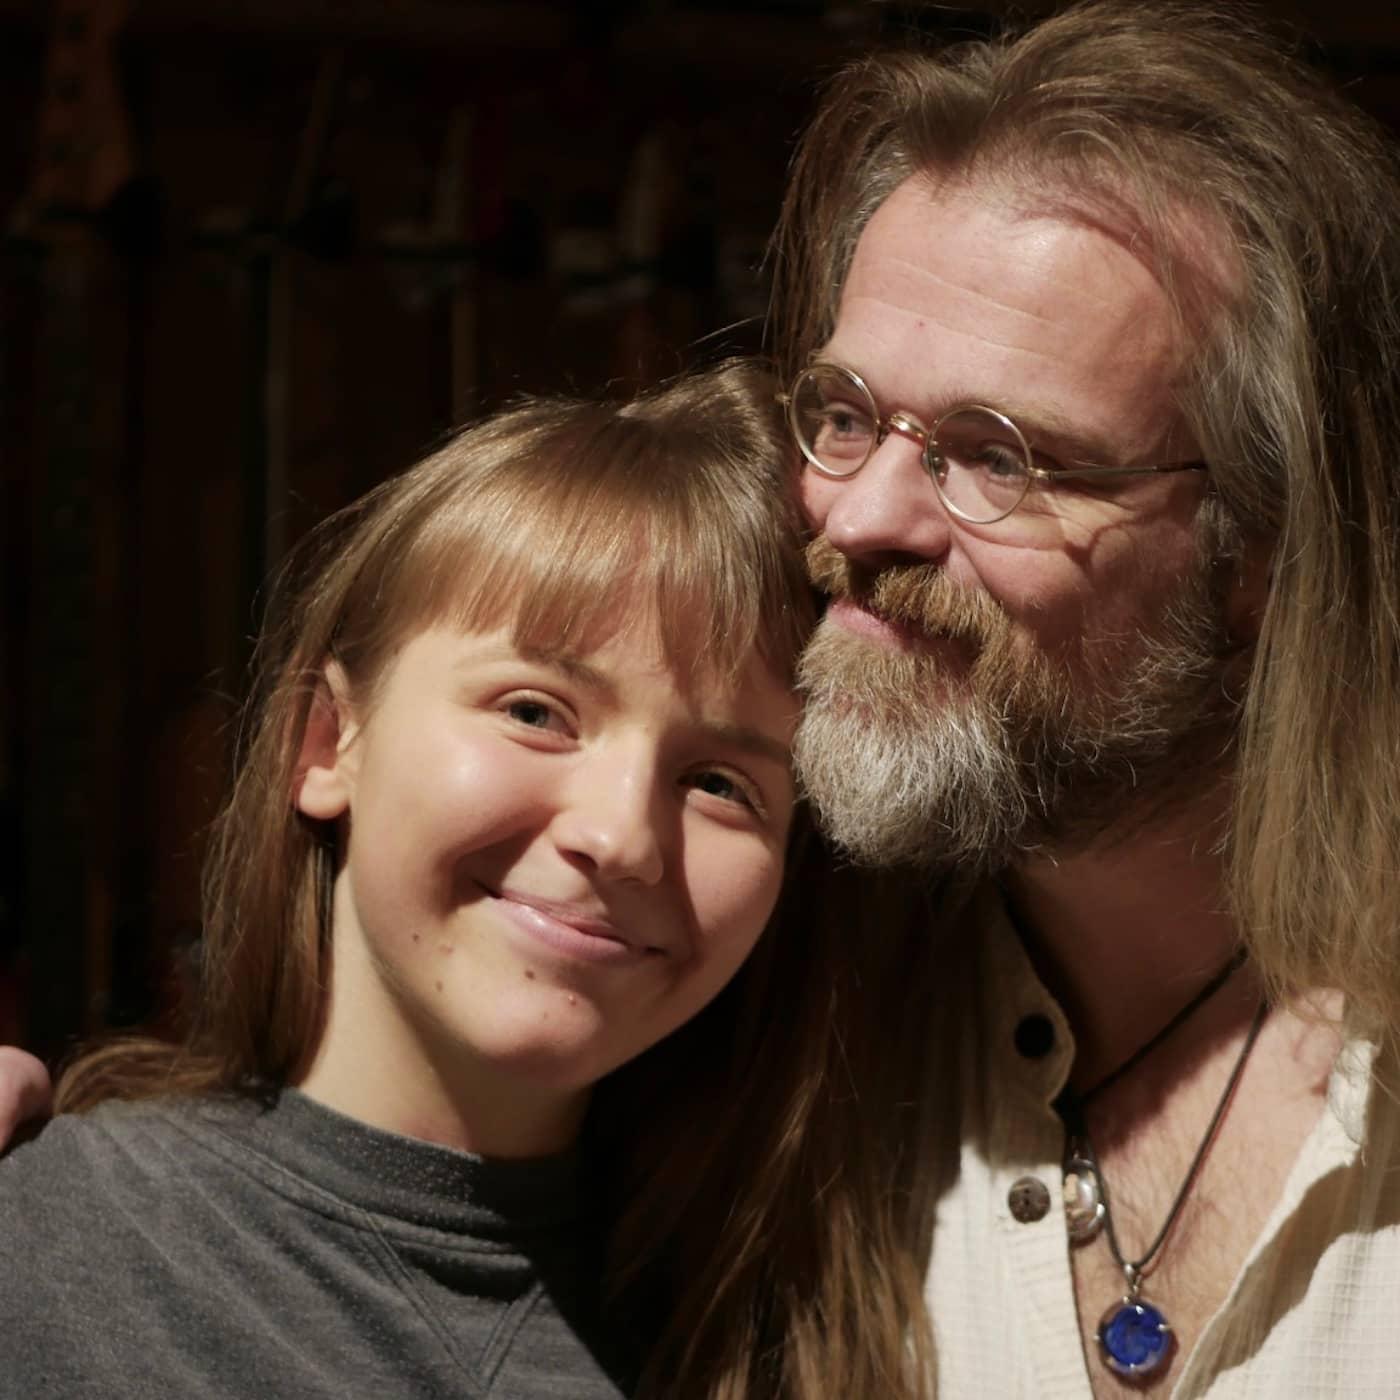 Christoffer ville inte få en son - nu gör han musik med dottern Ingrid